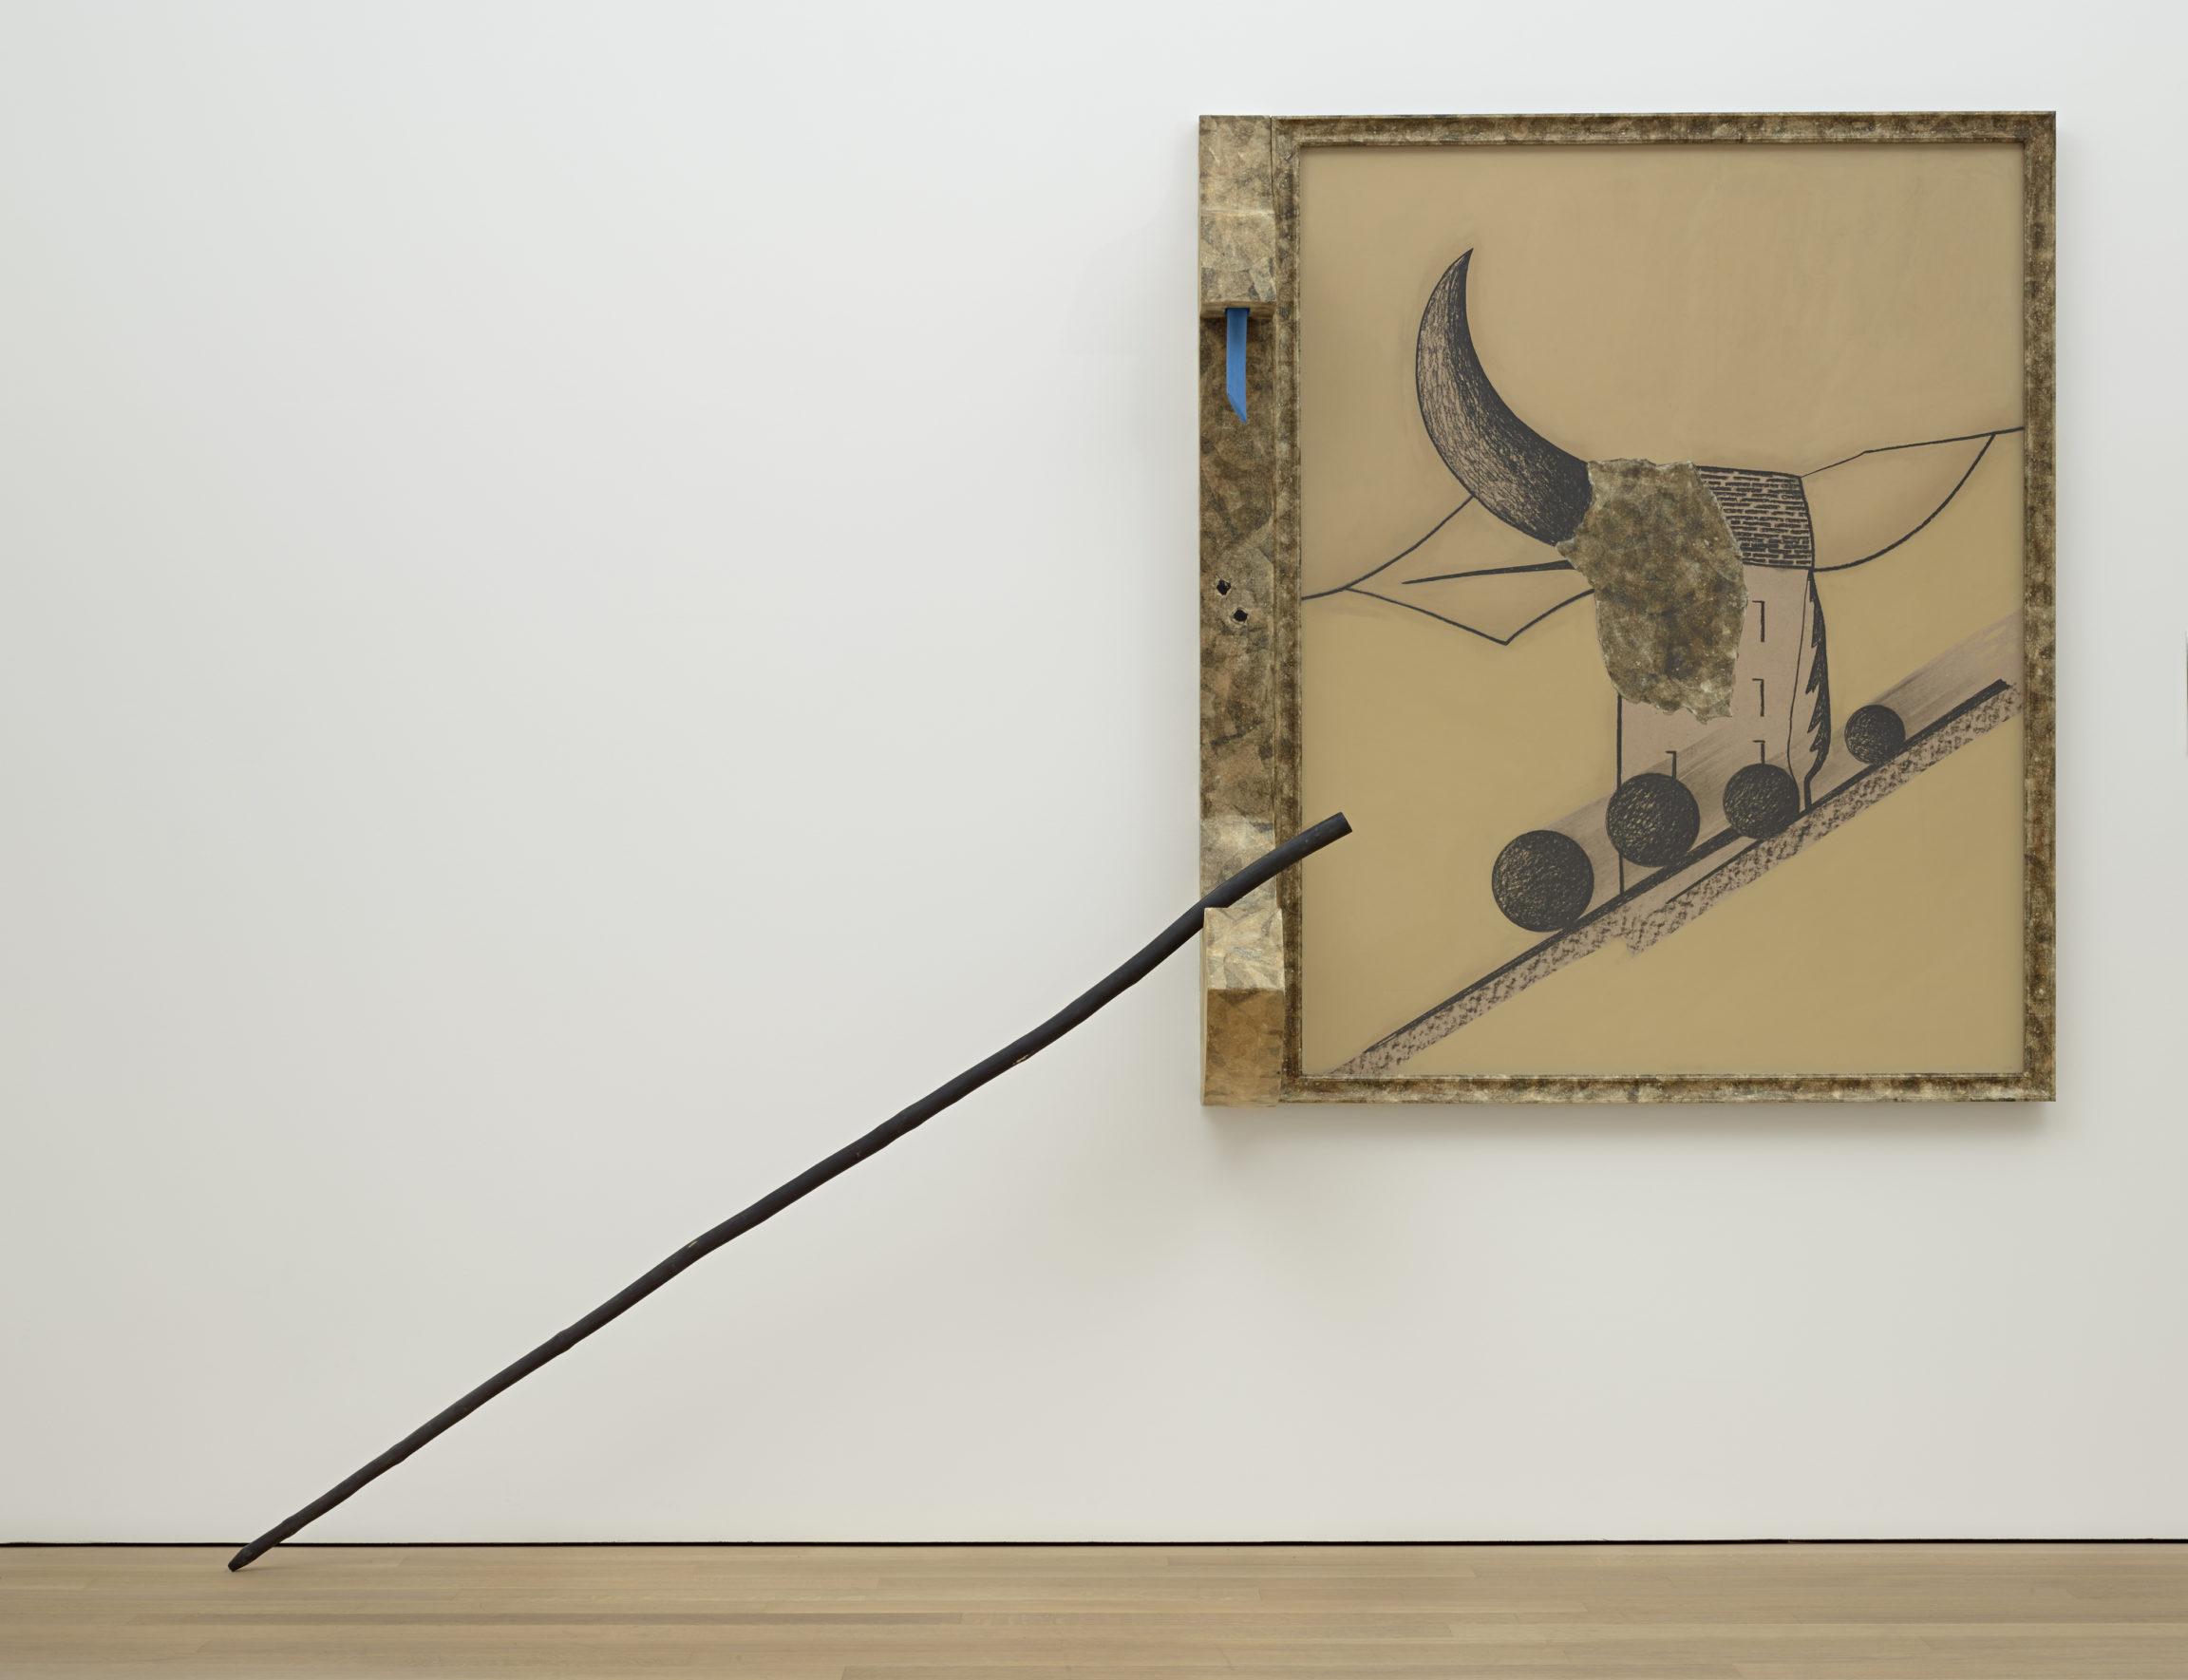 Flavio Paolucci, Peinture objet, 1983